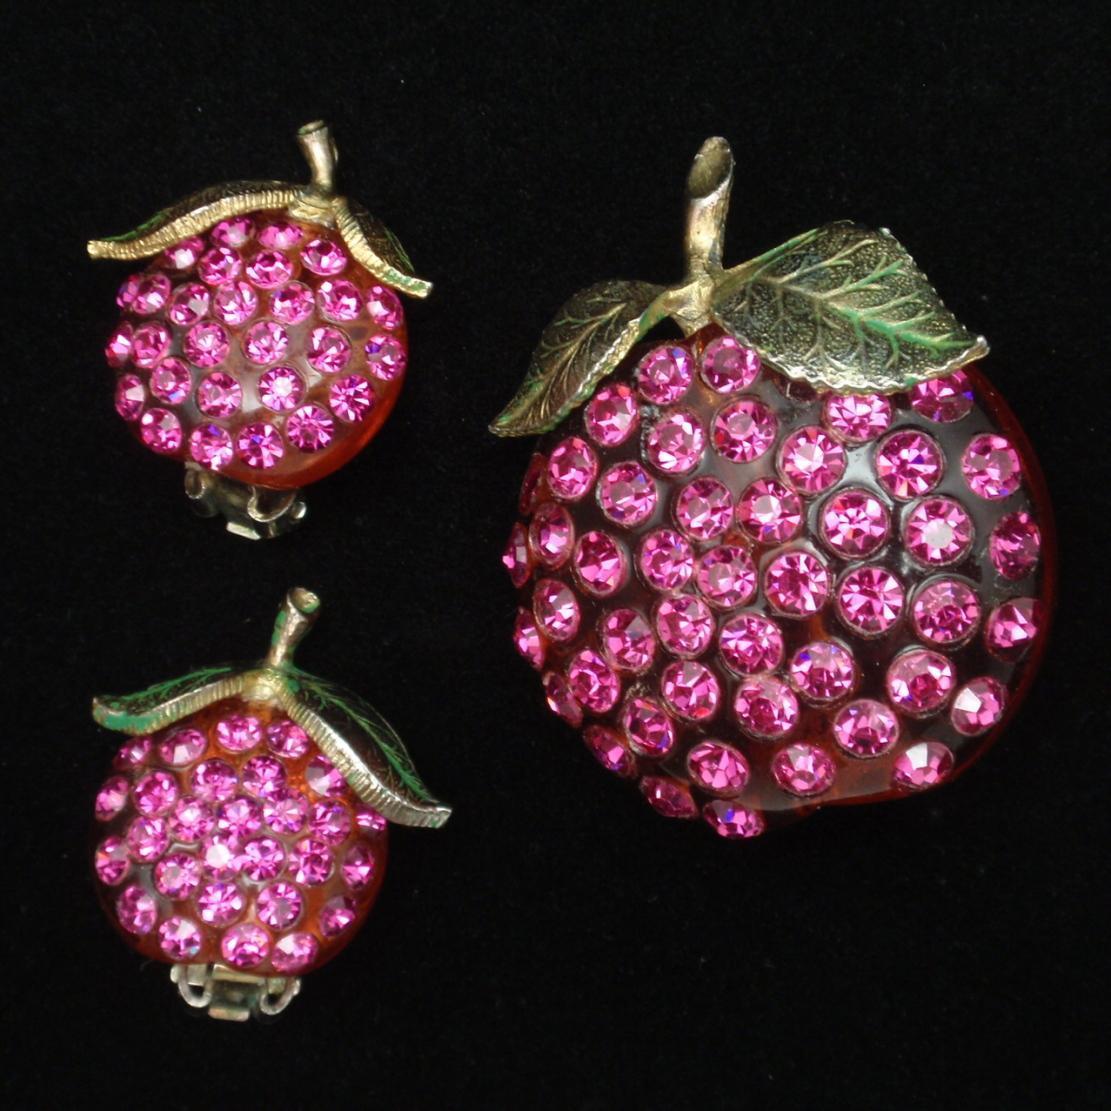 Forbidden Fruit Pin & Earrings Set Rhinestones Lucite Hot Pink Stones Vintage